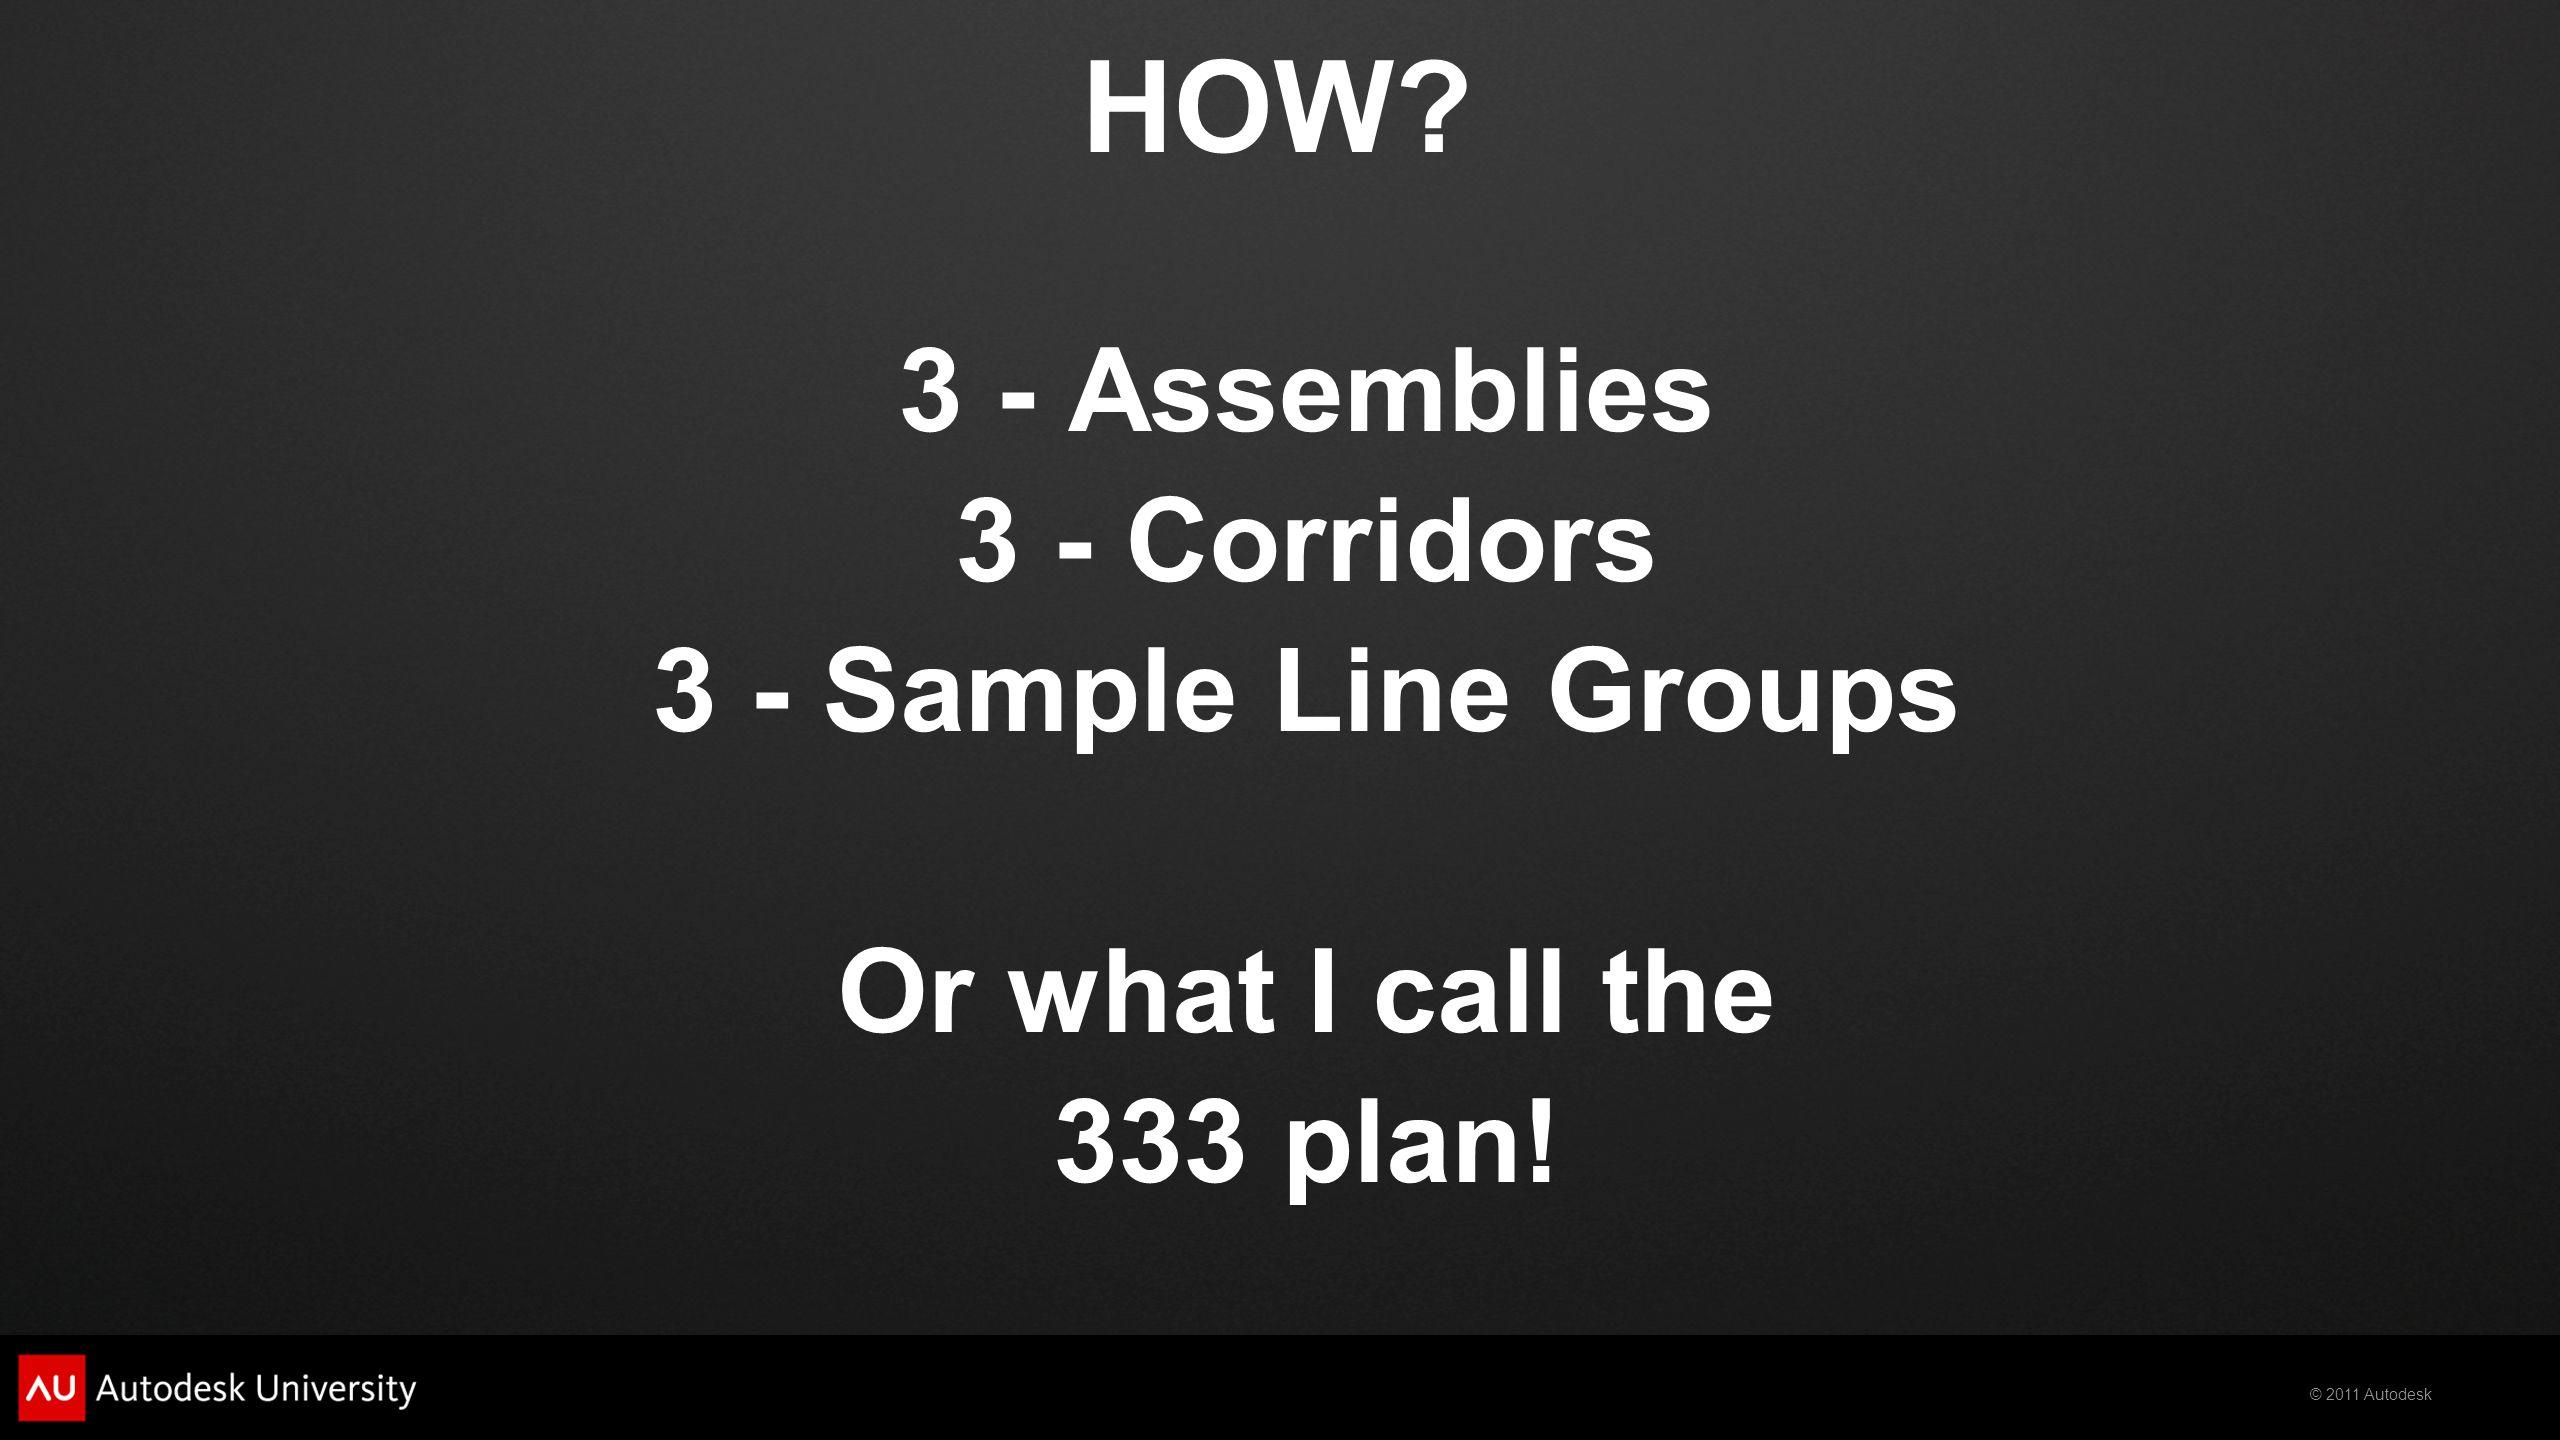 HOW 3 - Assemblies 3 - Corridors 3 - Sample Line Groups